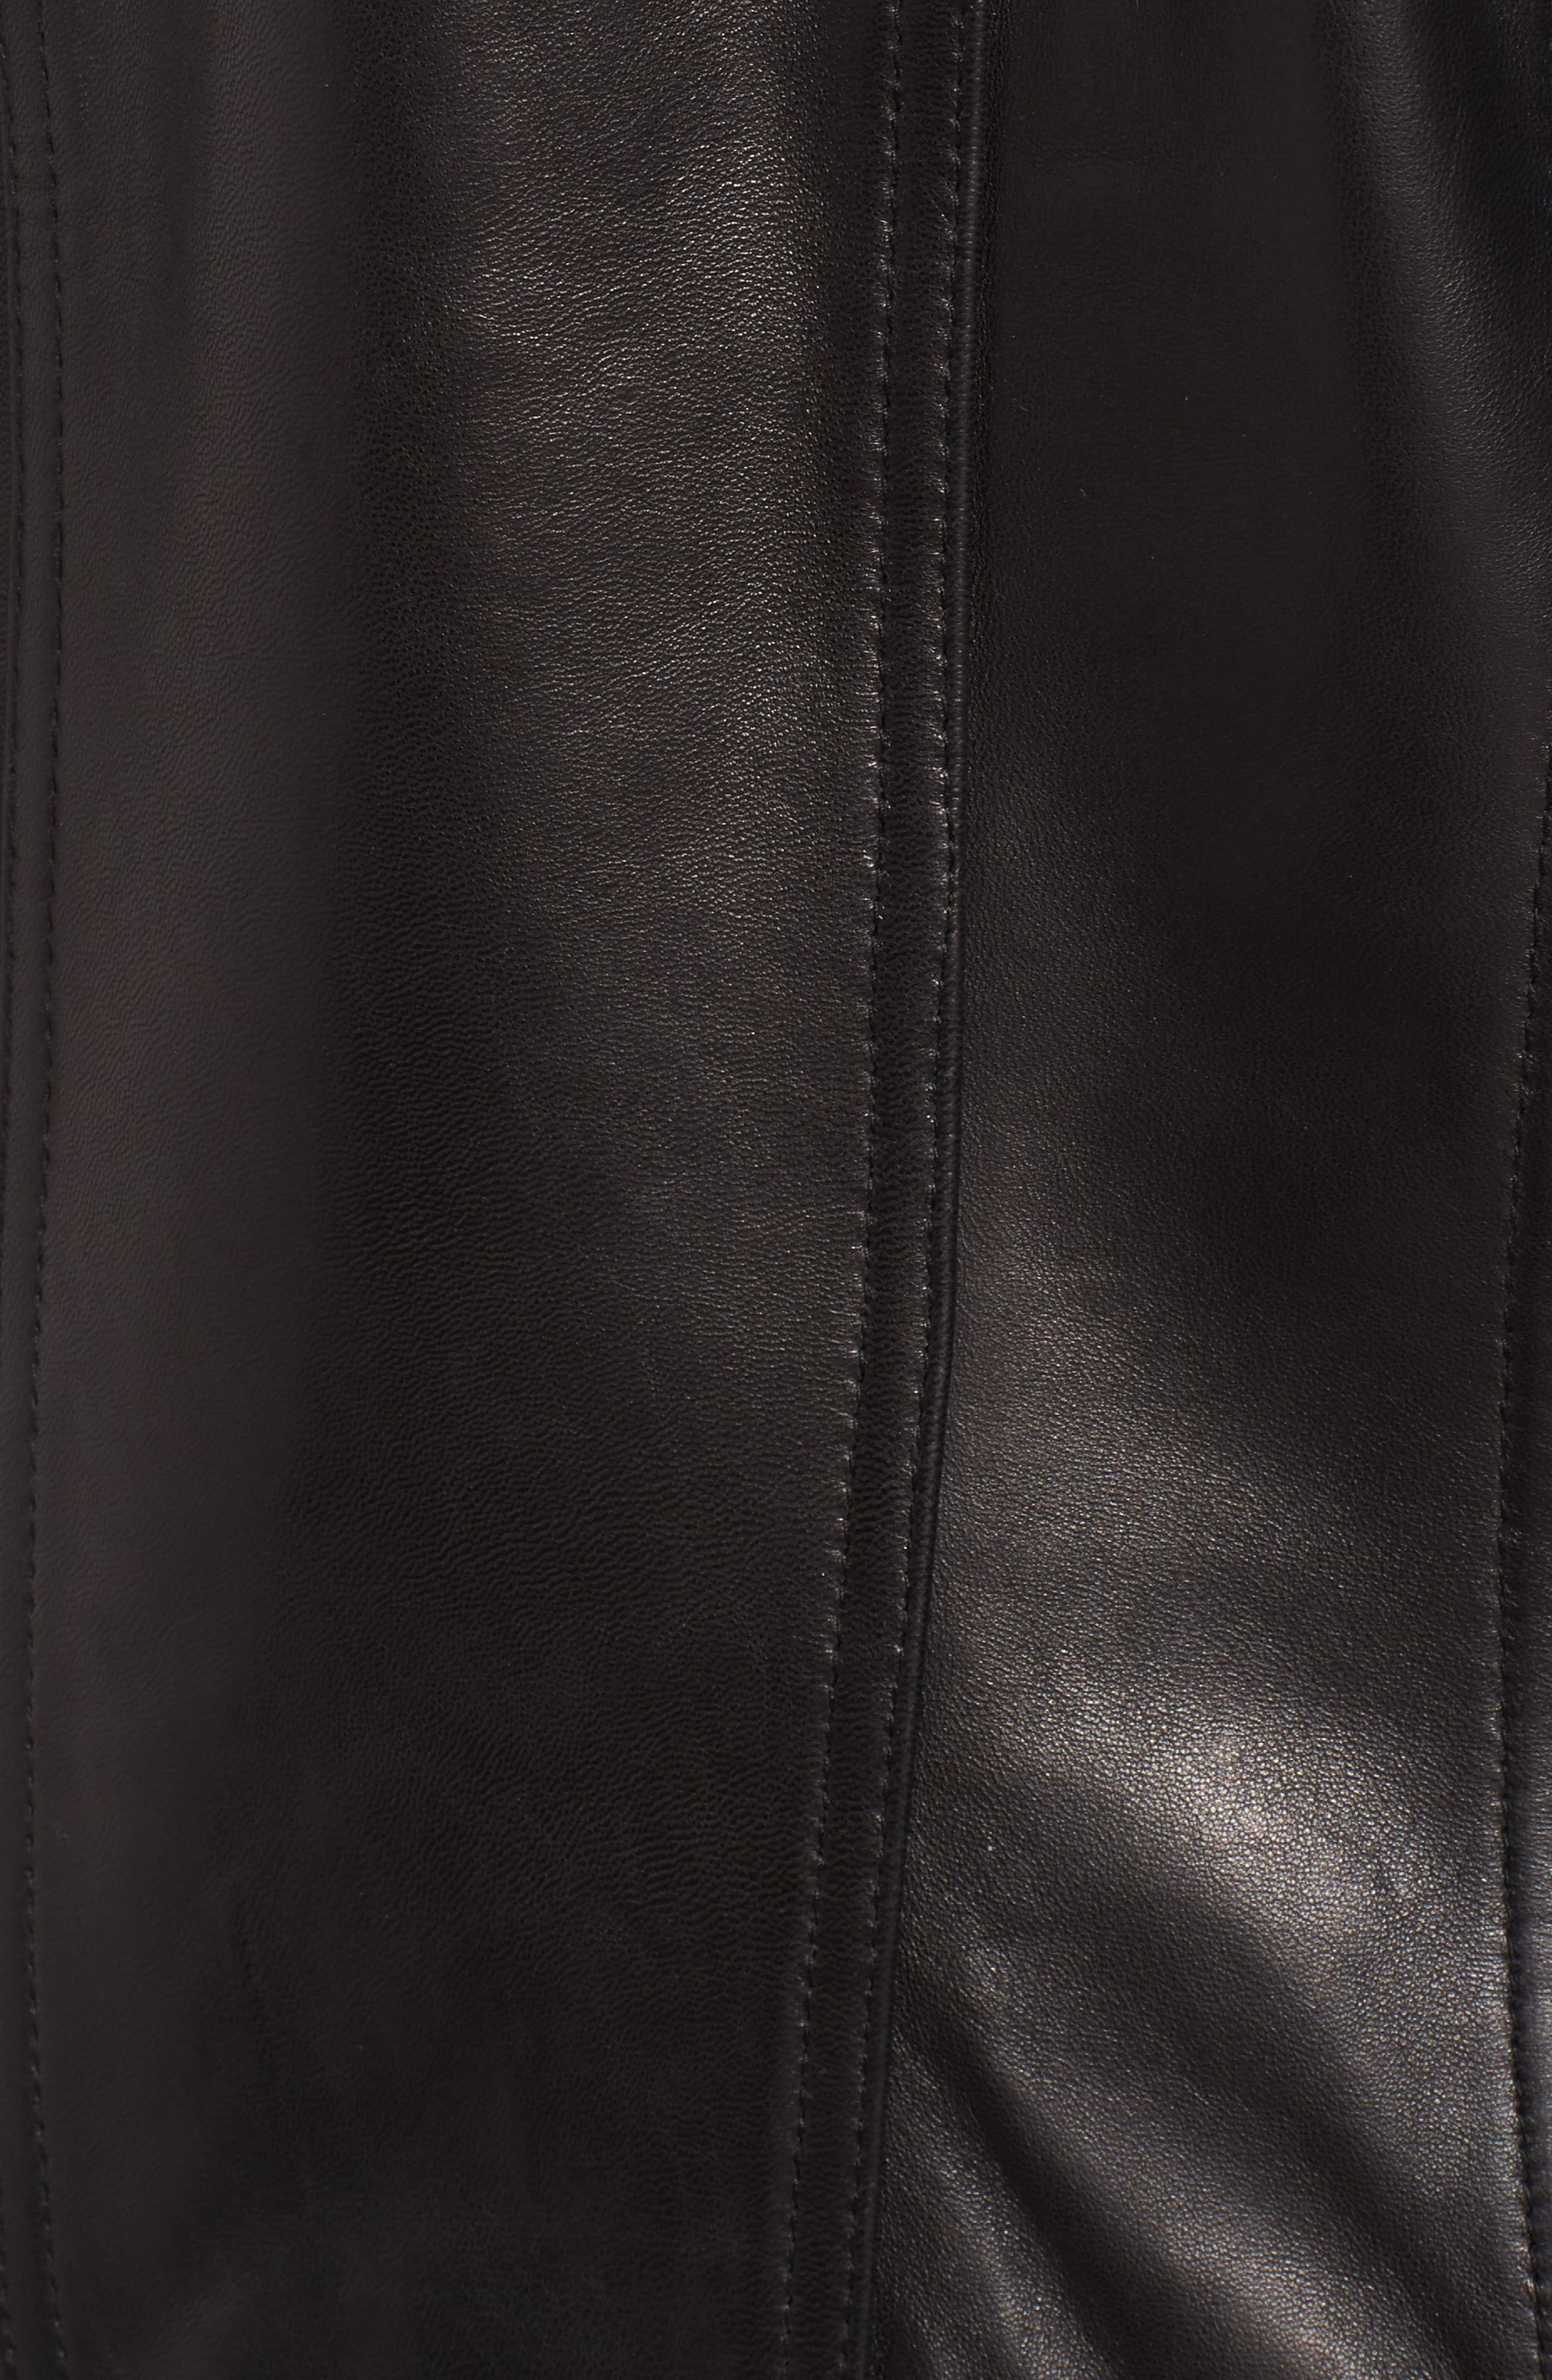 Braid Detail Leather Jacket,                             Alternate thumbnail 5, color,                             Black